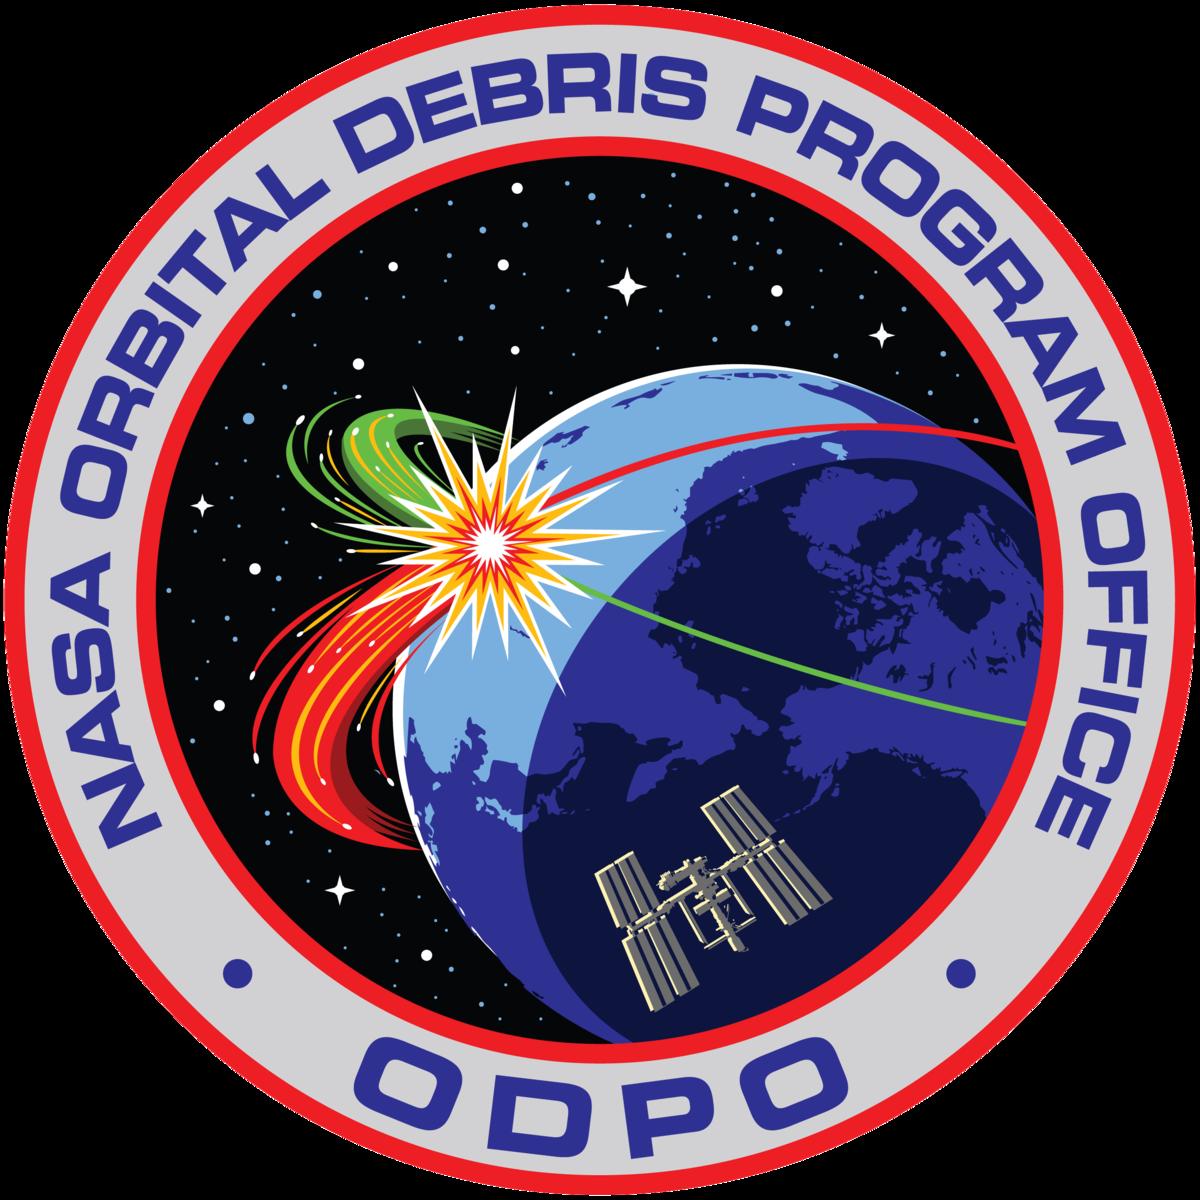 nasa orbital debris program office wikipedia